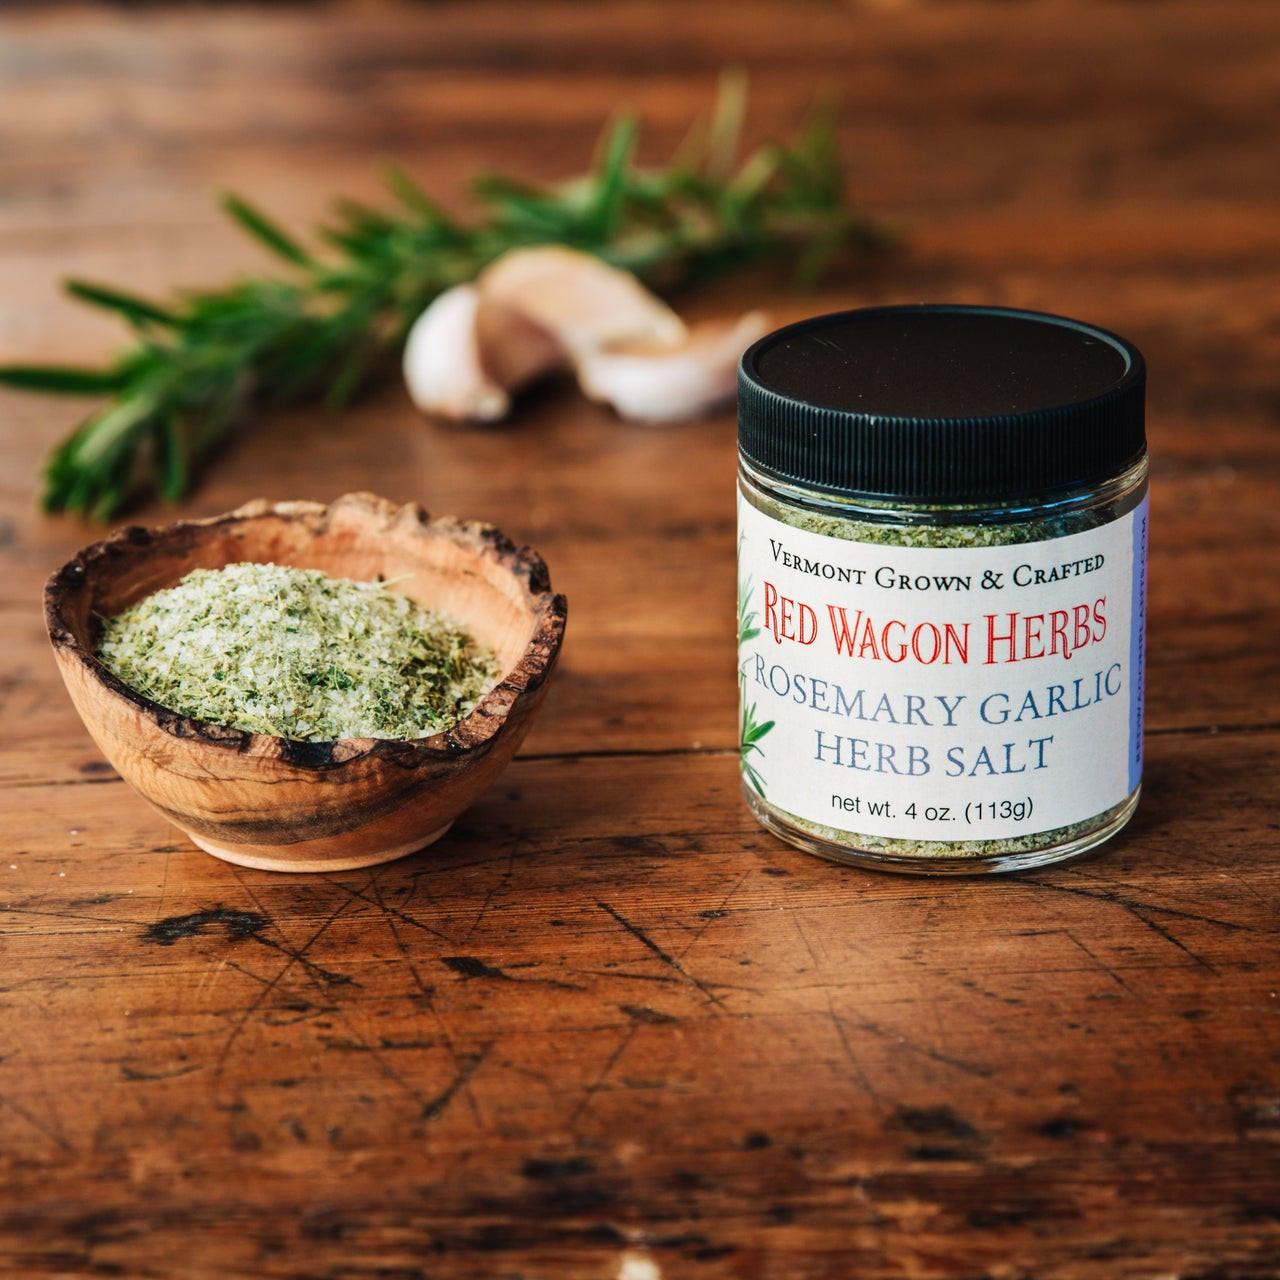 Rosemary Garlic Herb Salt - Red Wagon Herbs